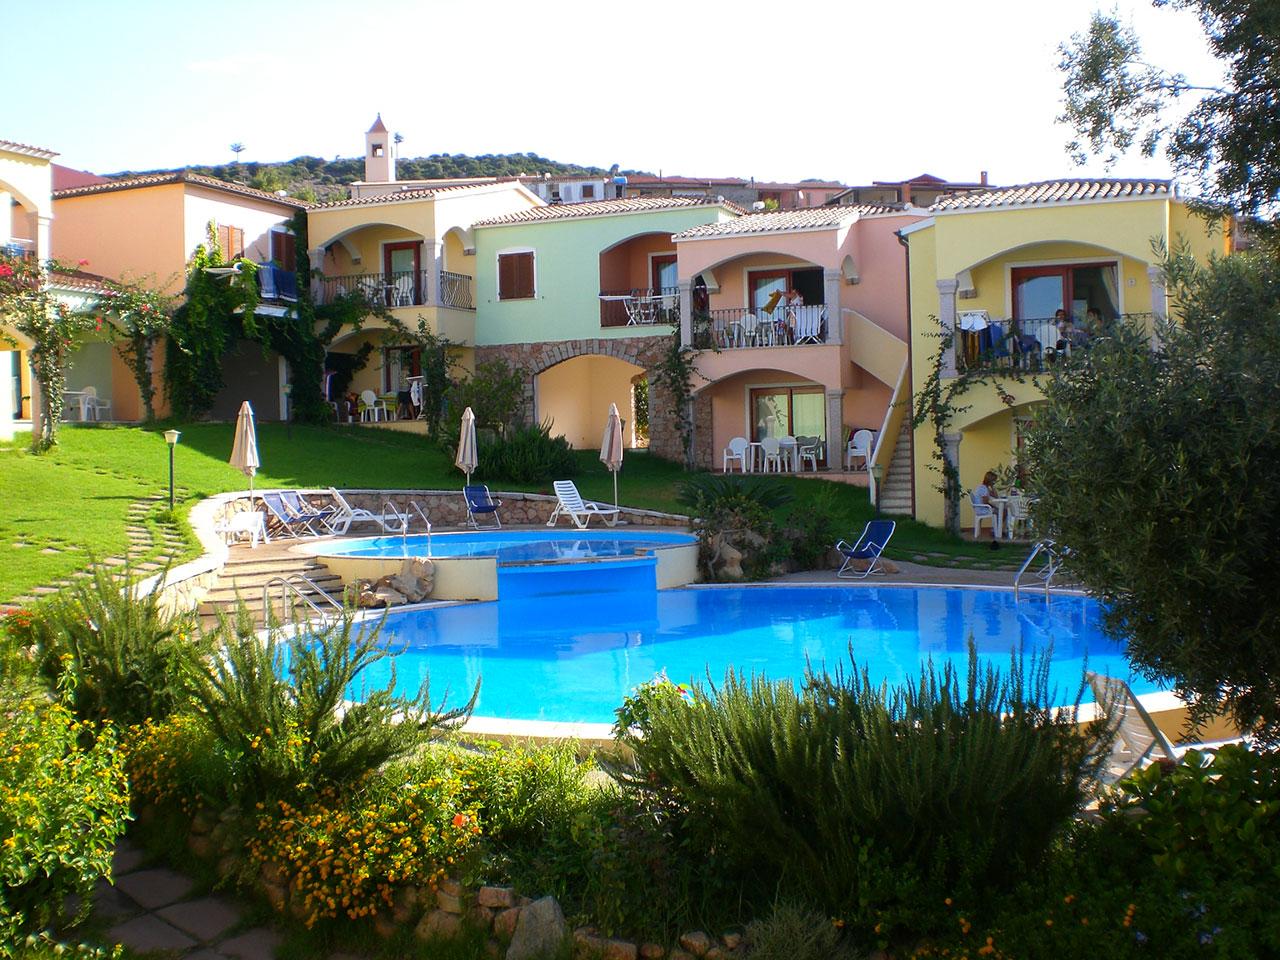 Residence badus badesi sardaigne italie for Residence in sardegna